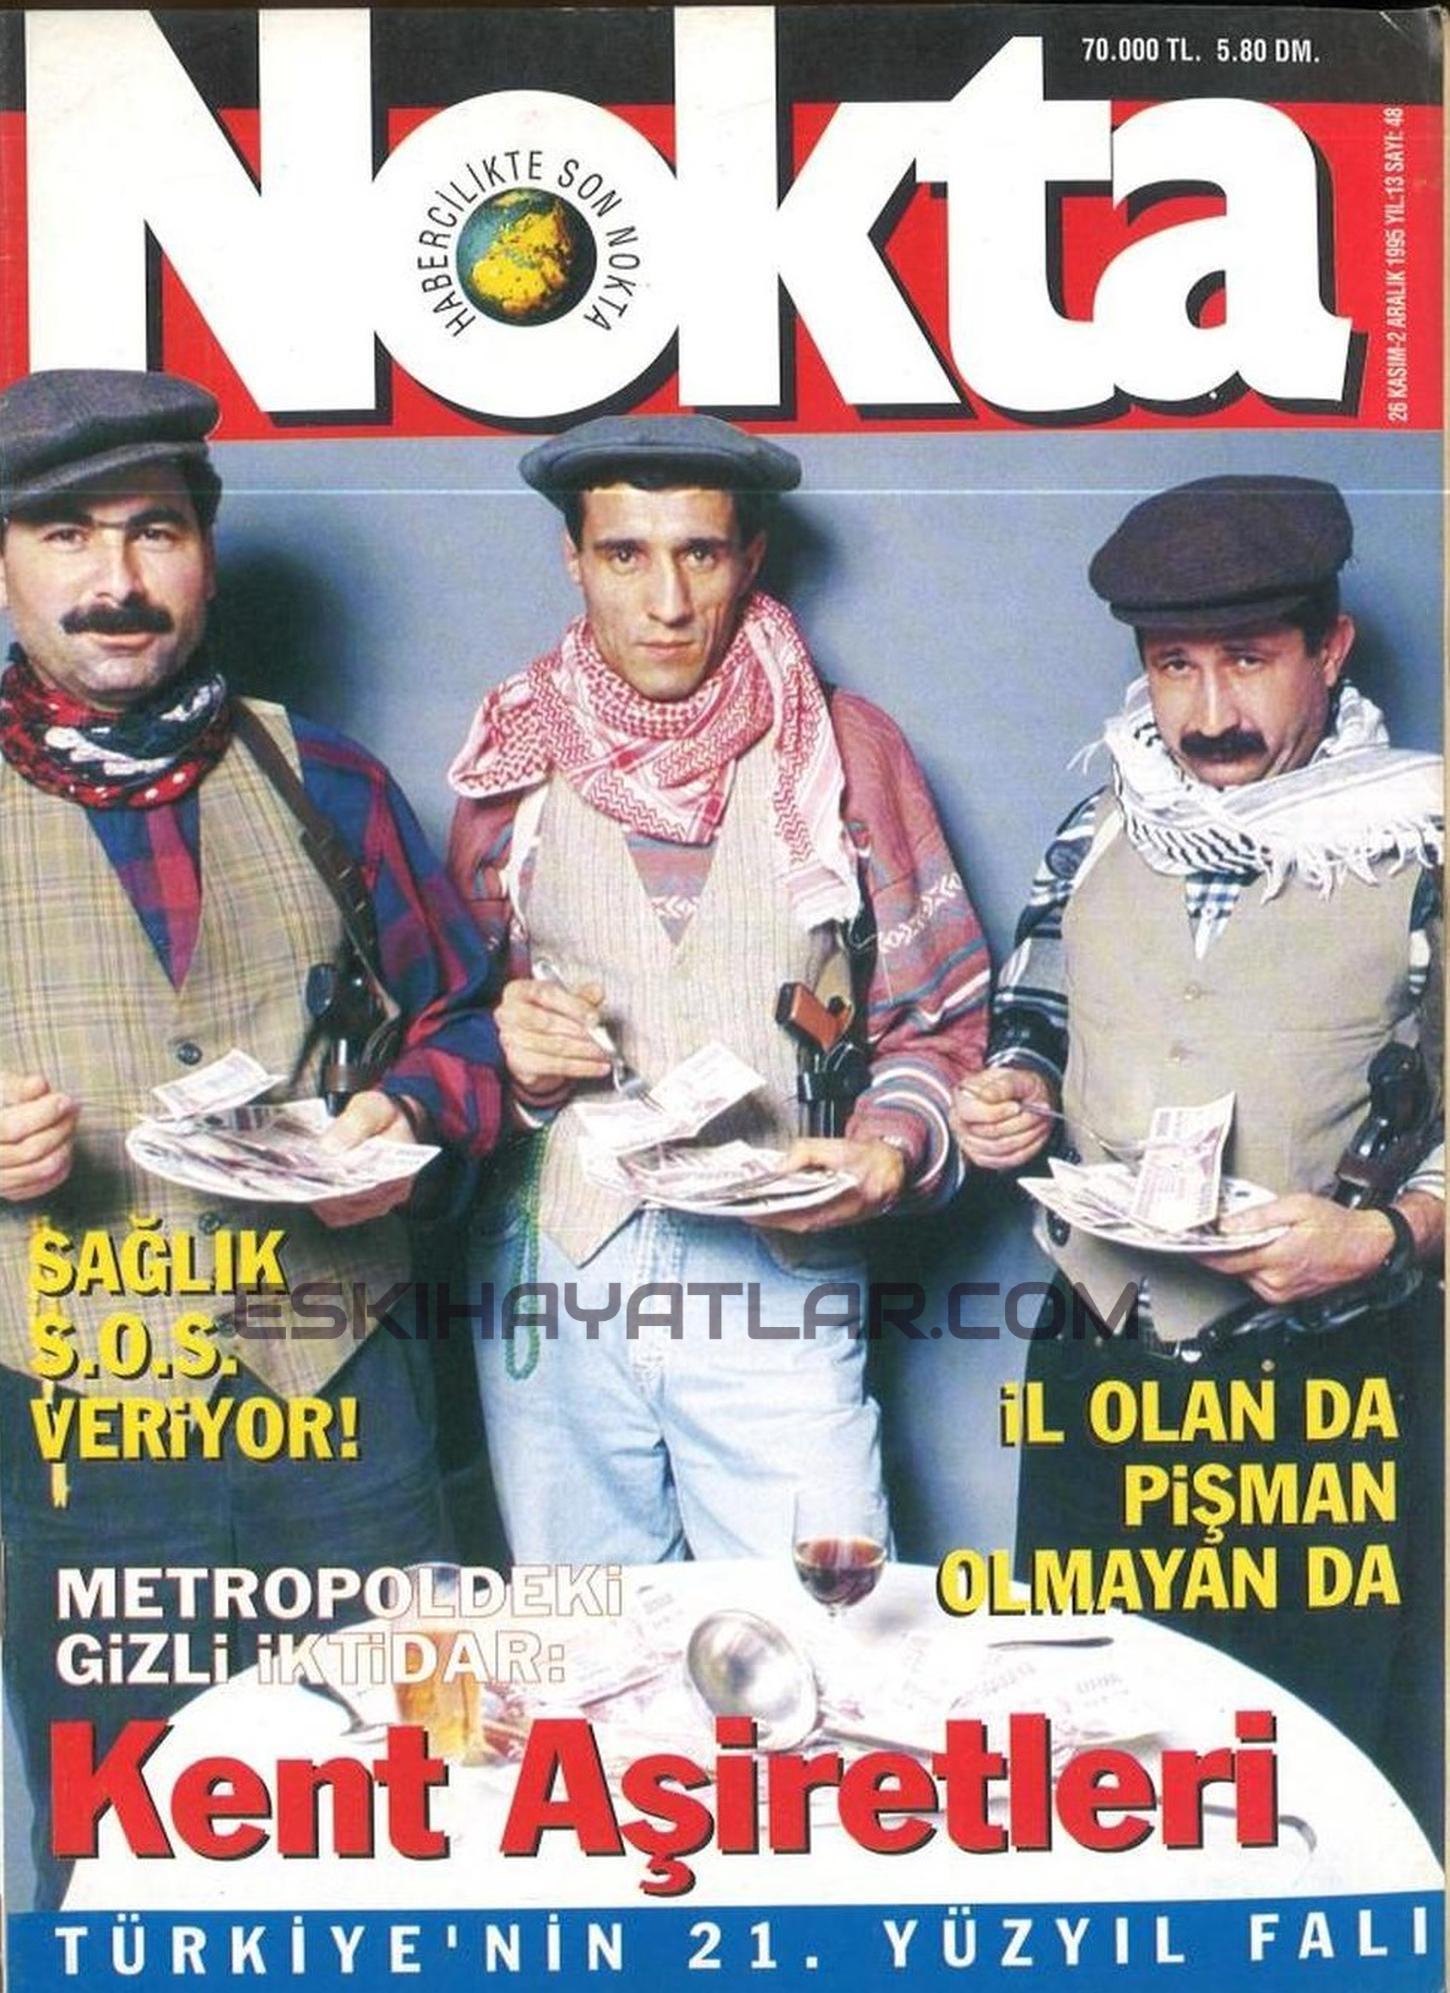 metropoldeki-gizli-iktidar-kent-asiretleri-nokta-dergisi-arsivleri (1)